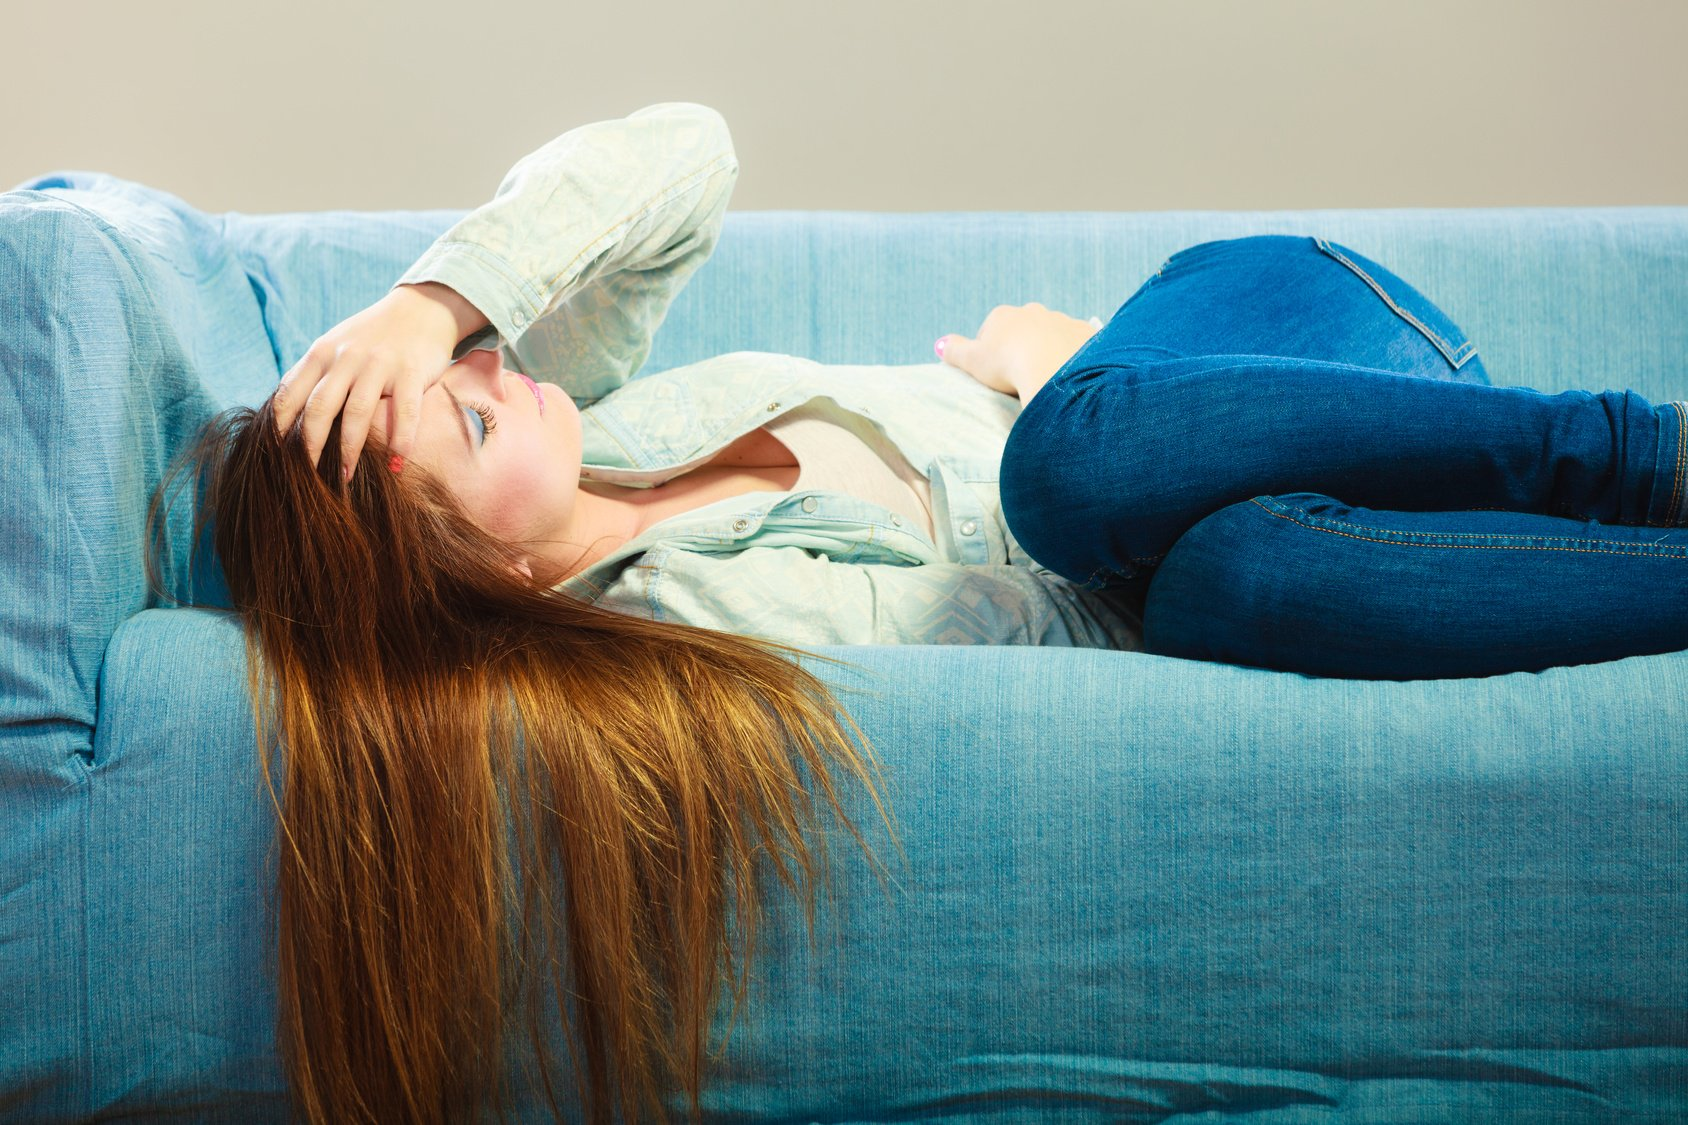 lethargic woman on couch powerofpositivity - 연인에게 '중독'된 당신에게 나타나는 위험 신호 8가지